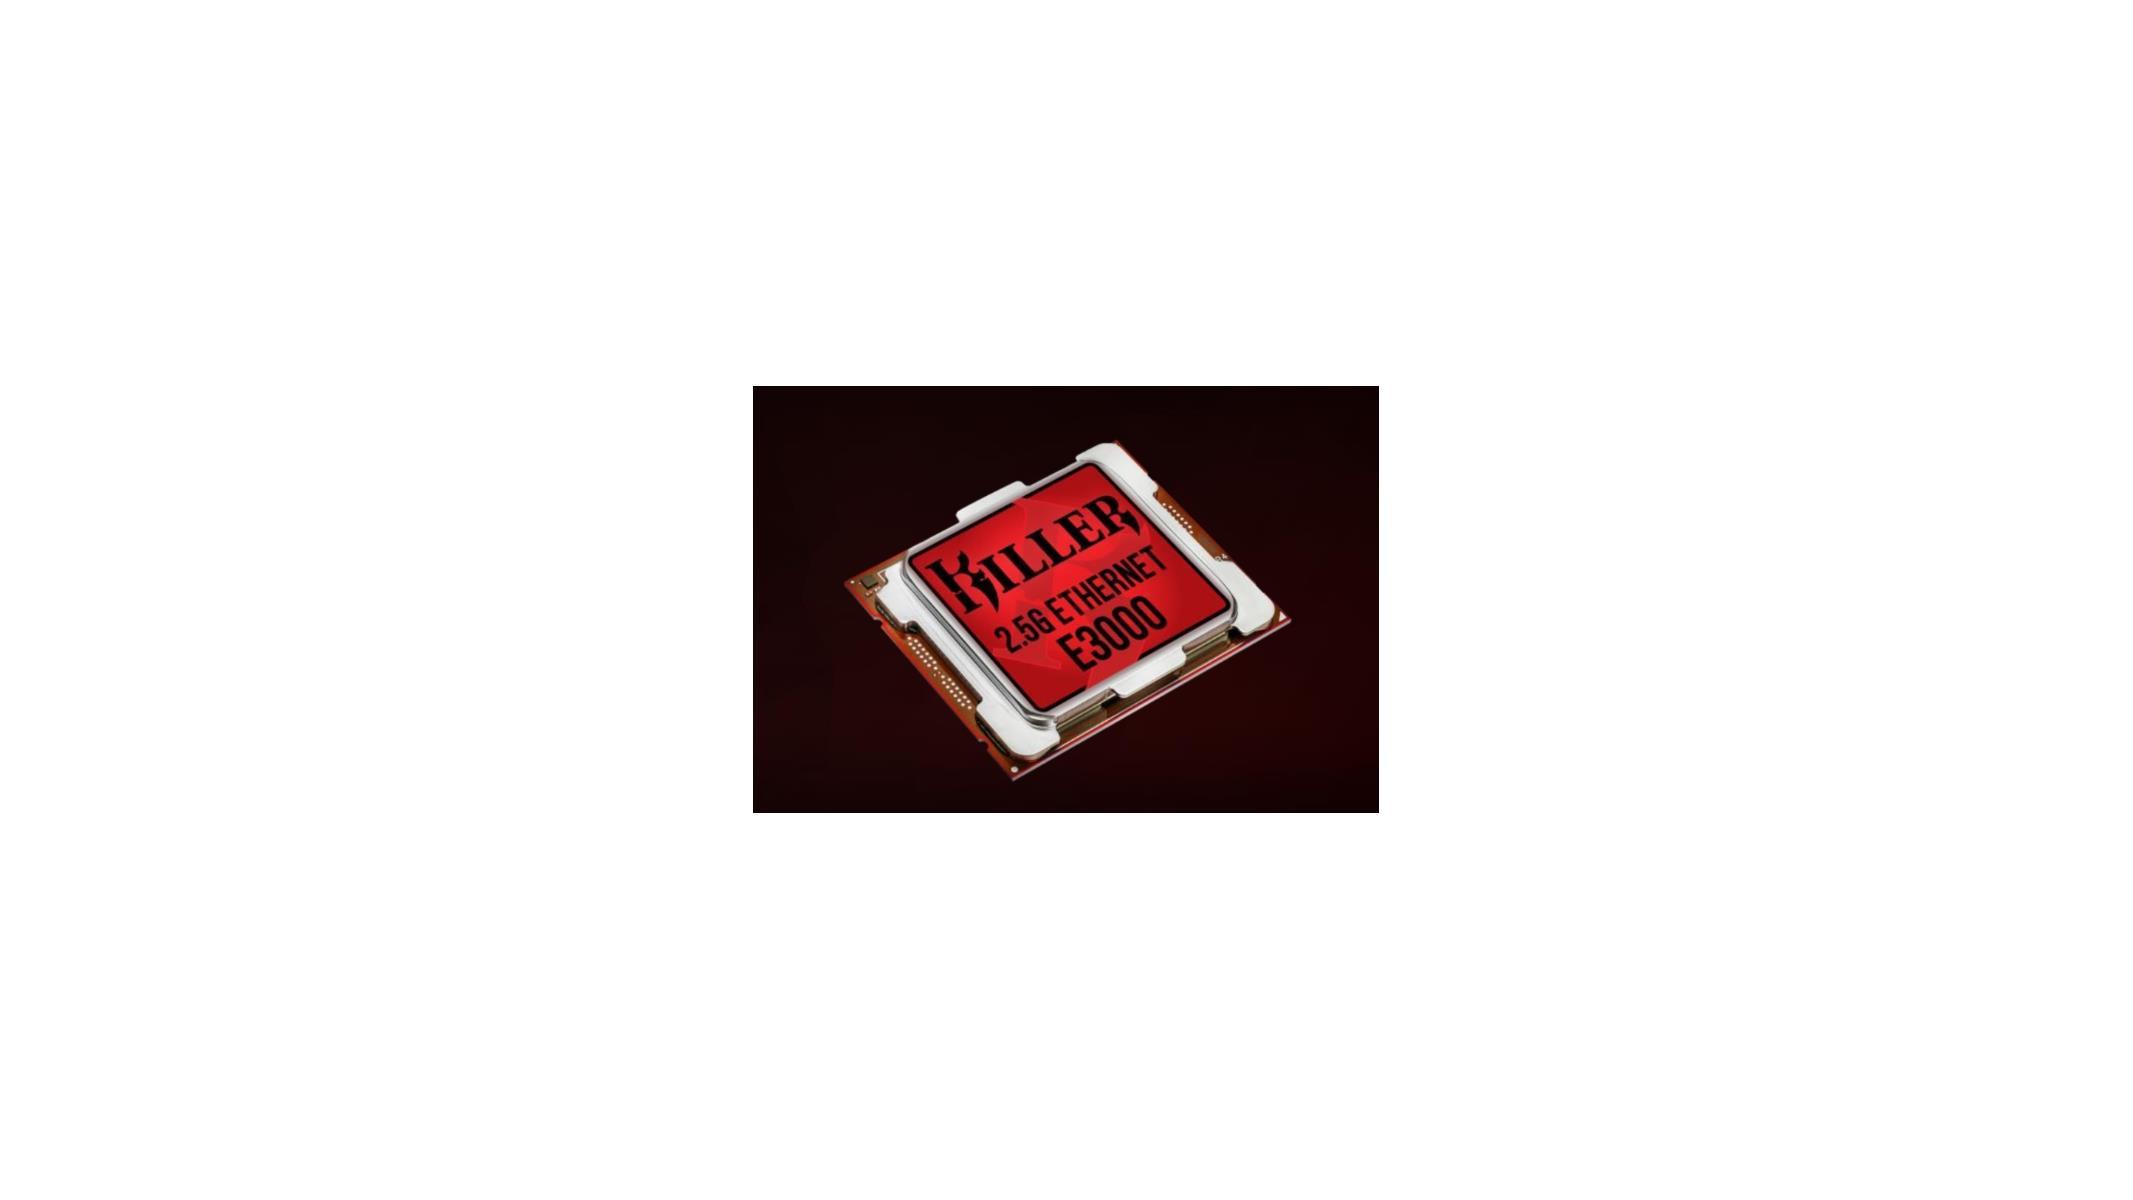 Rivet Networks Unwraps Killer E3000 2 5 Gbps Ethernet Controller For